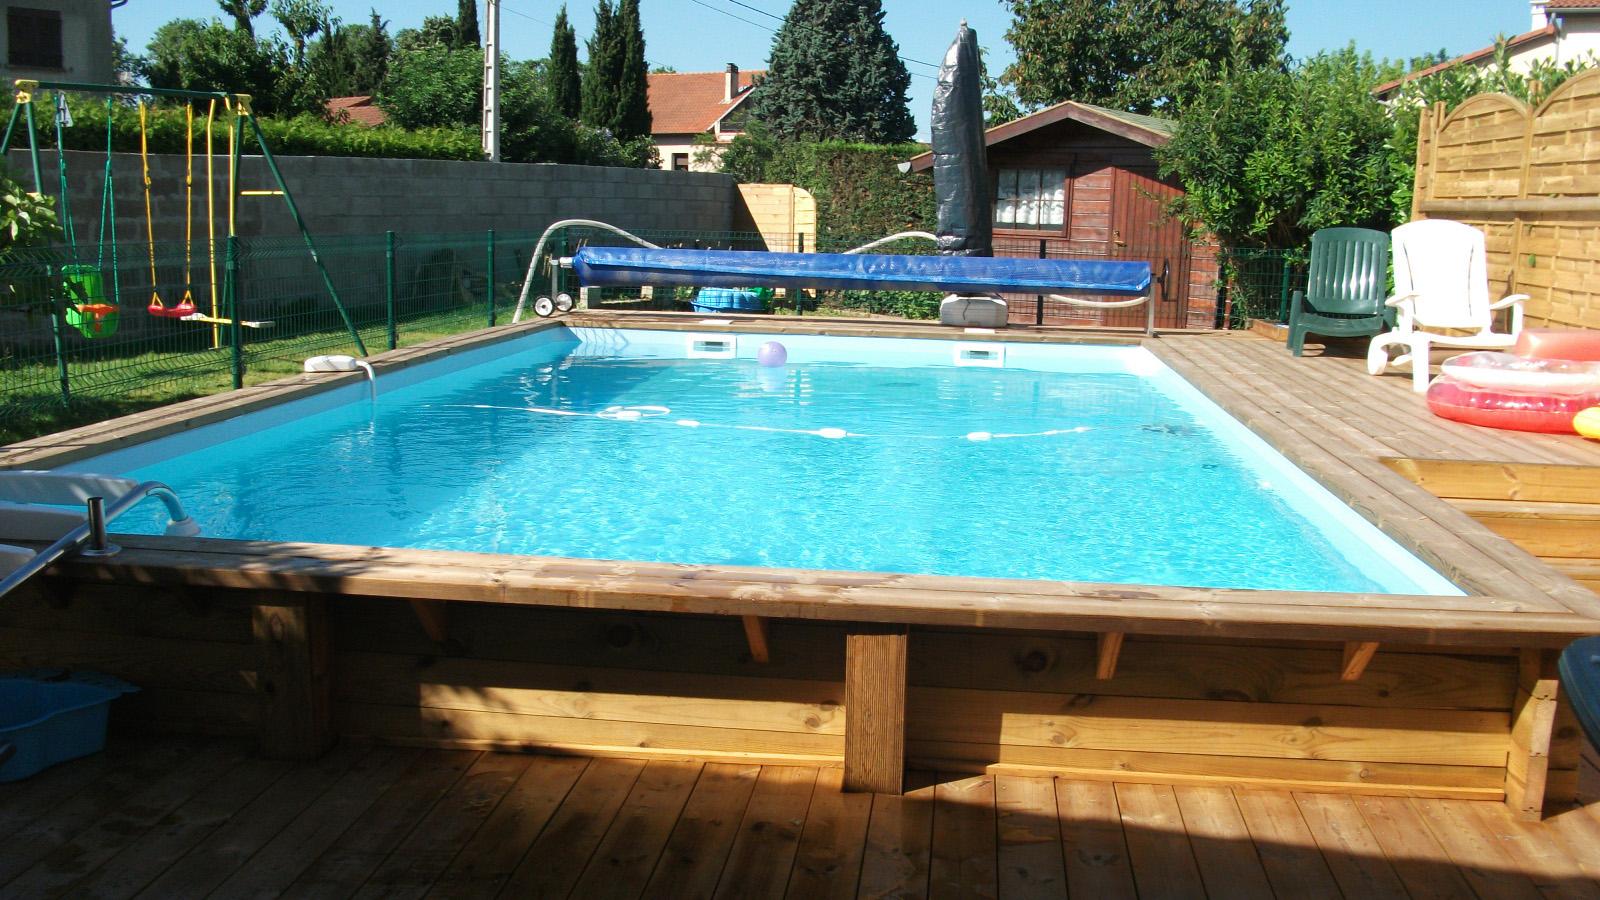 Bache piscine semi enterree - Prix piscine en bois semi enterree ...